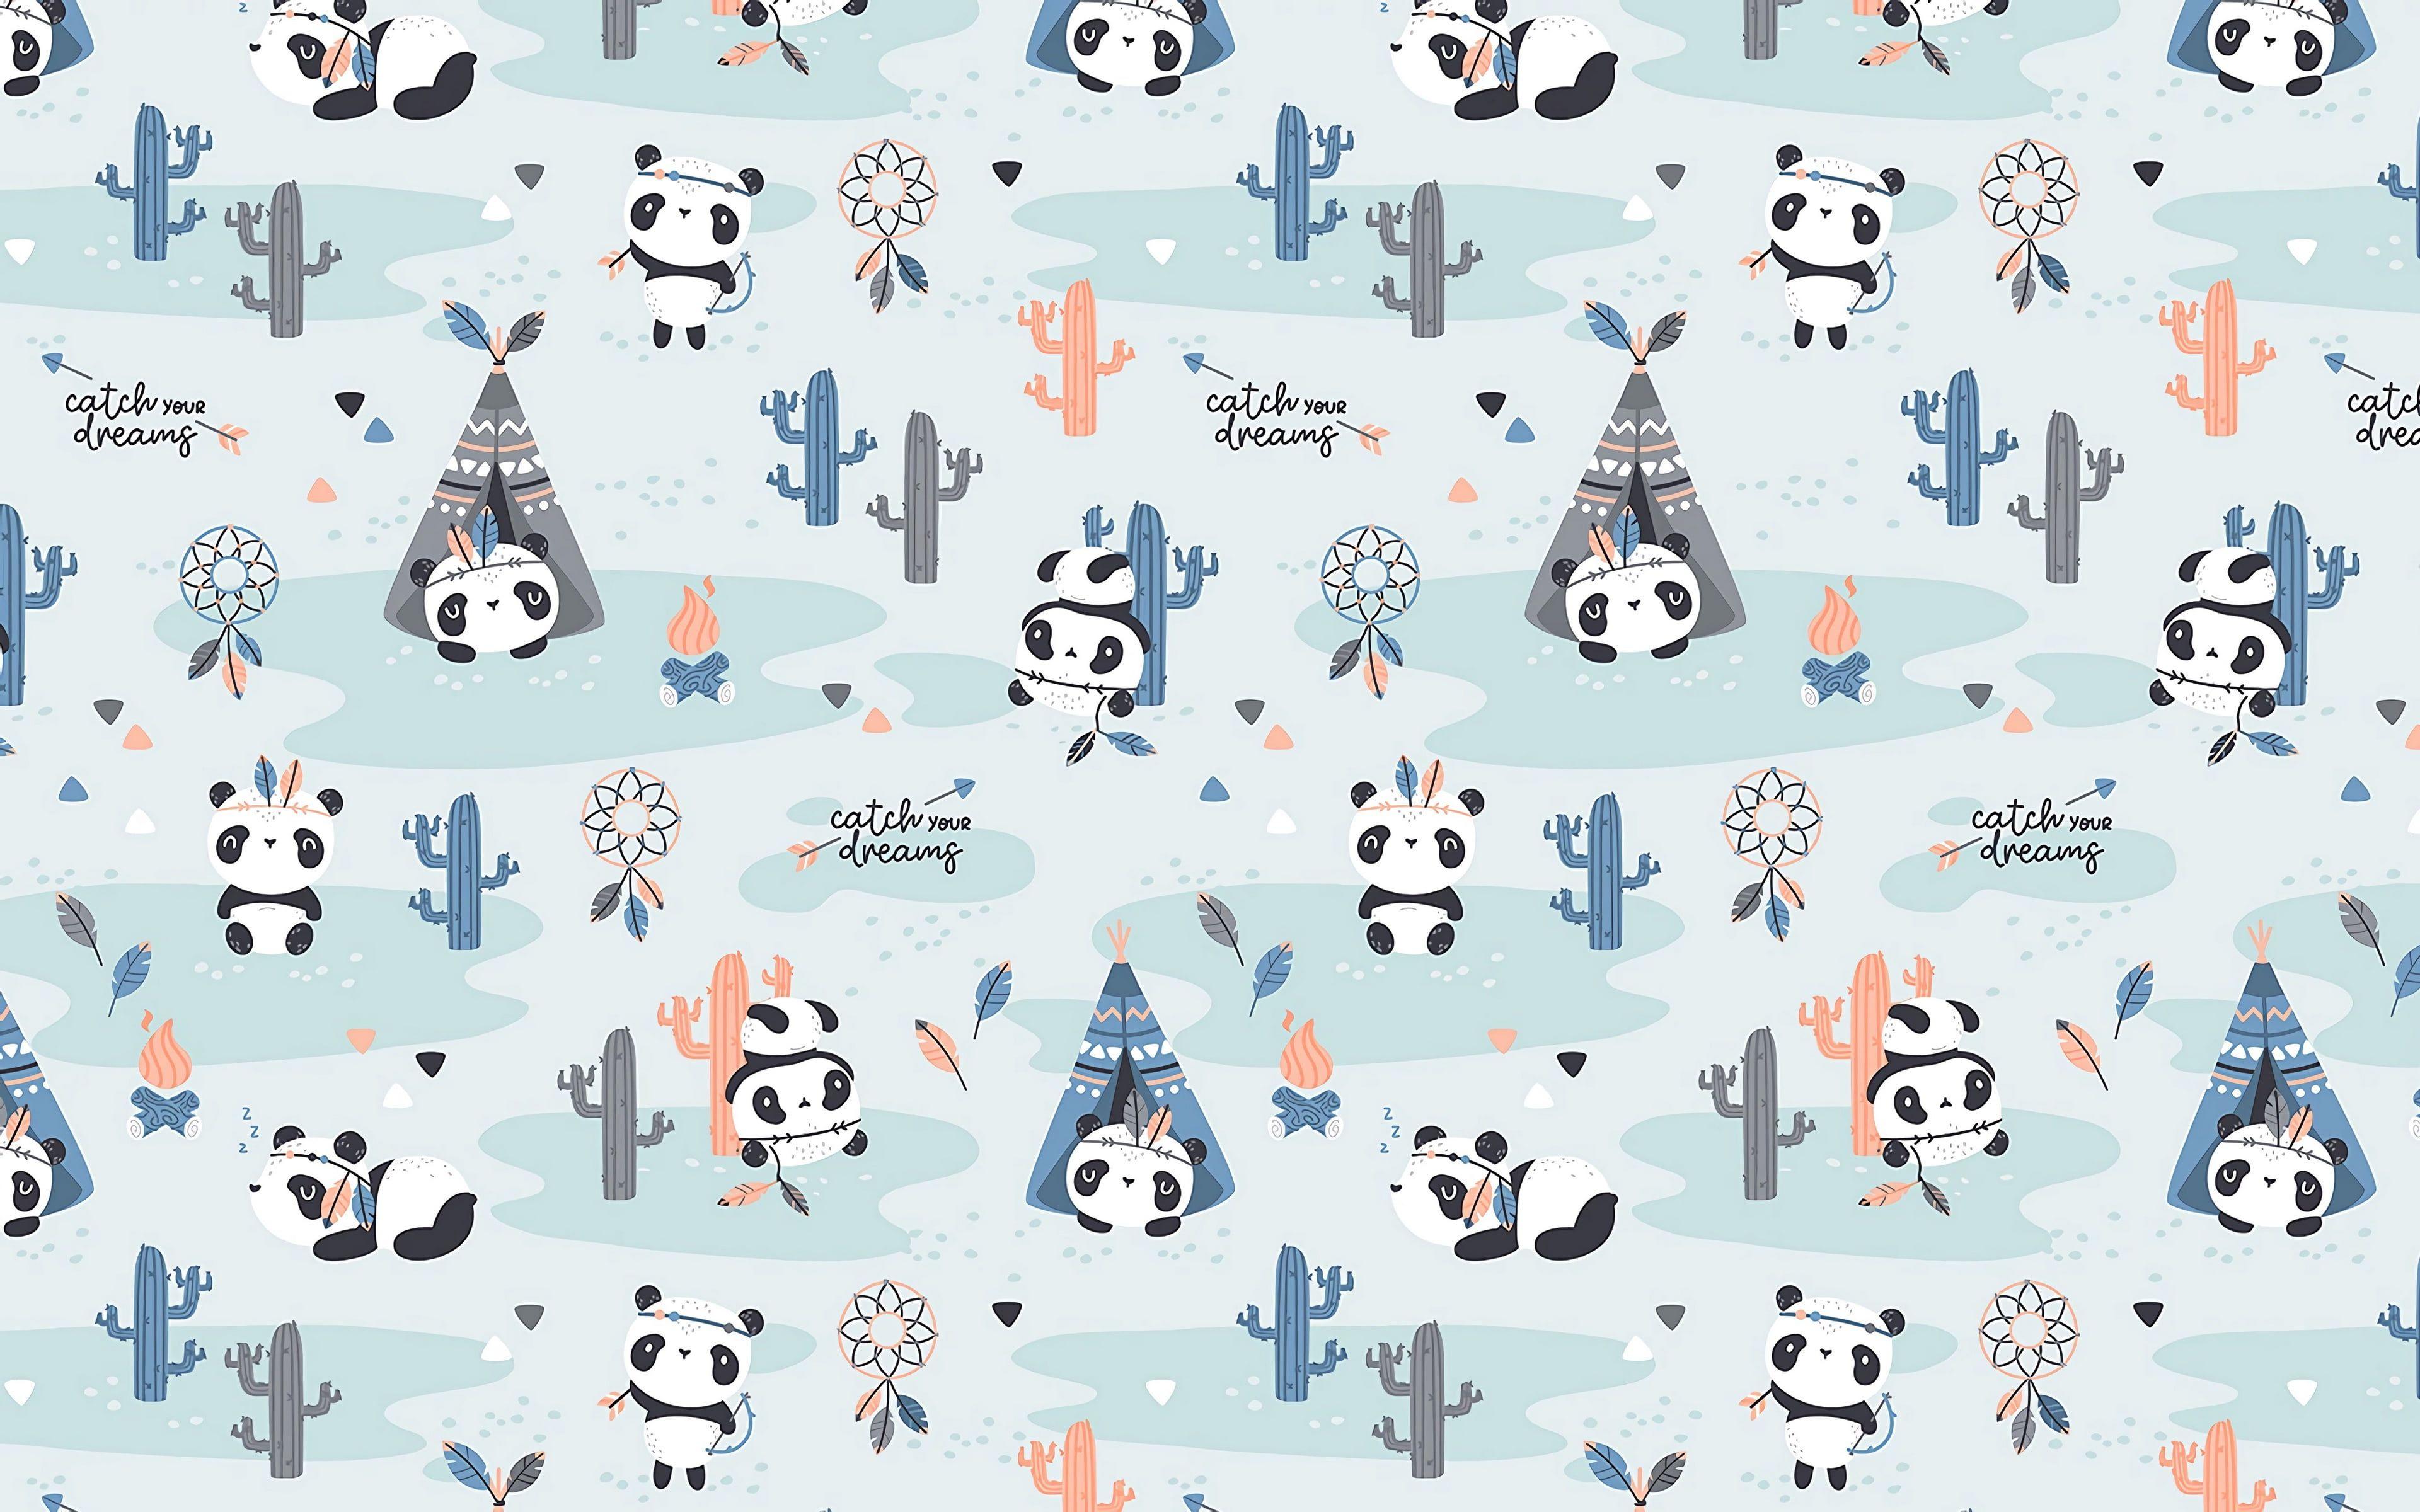 Pattern Textures Funny Cute 4k Ultra Hd Background Pandas 4k Wallpaper Hdwallpaper Desk Textile Pattern Design Surface Pattern Design Panda Wallpapers